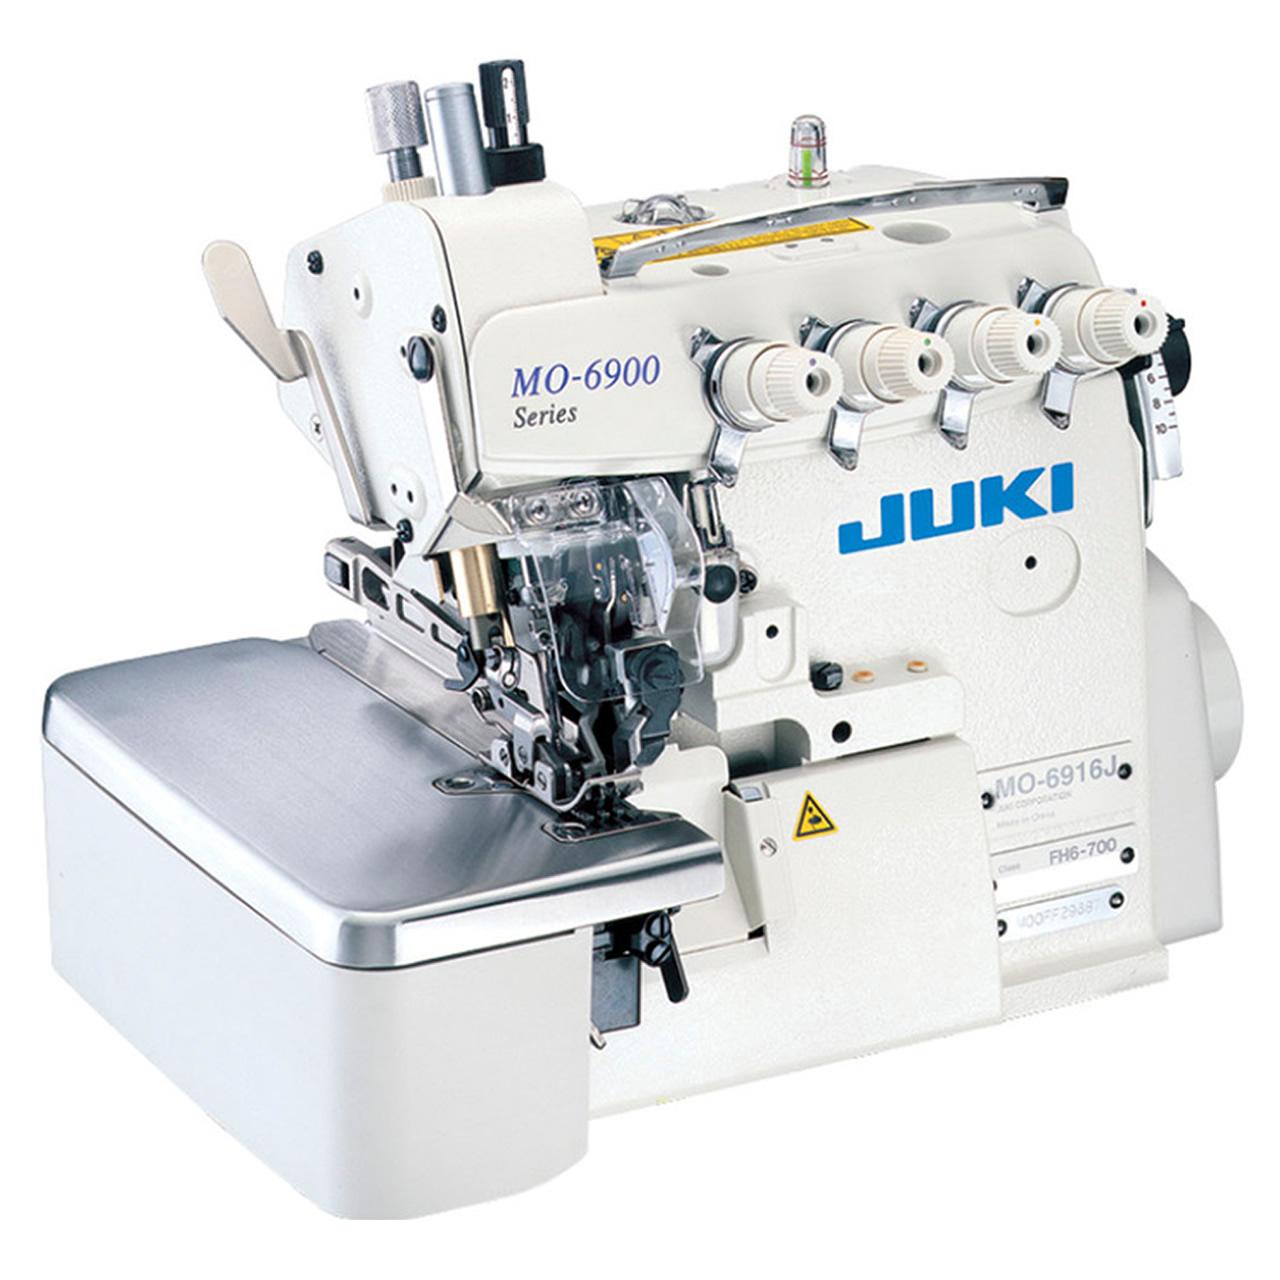 JUKI MO-6900G Series – Find Sewing Machine